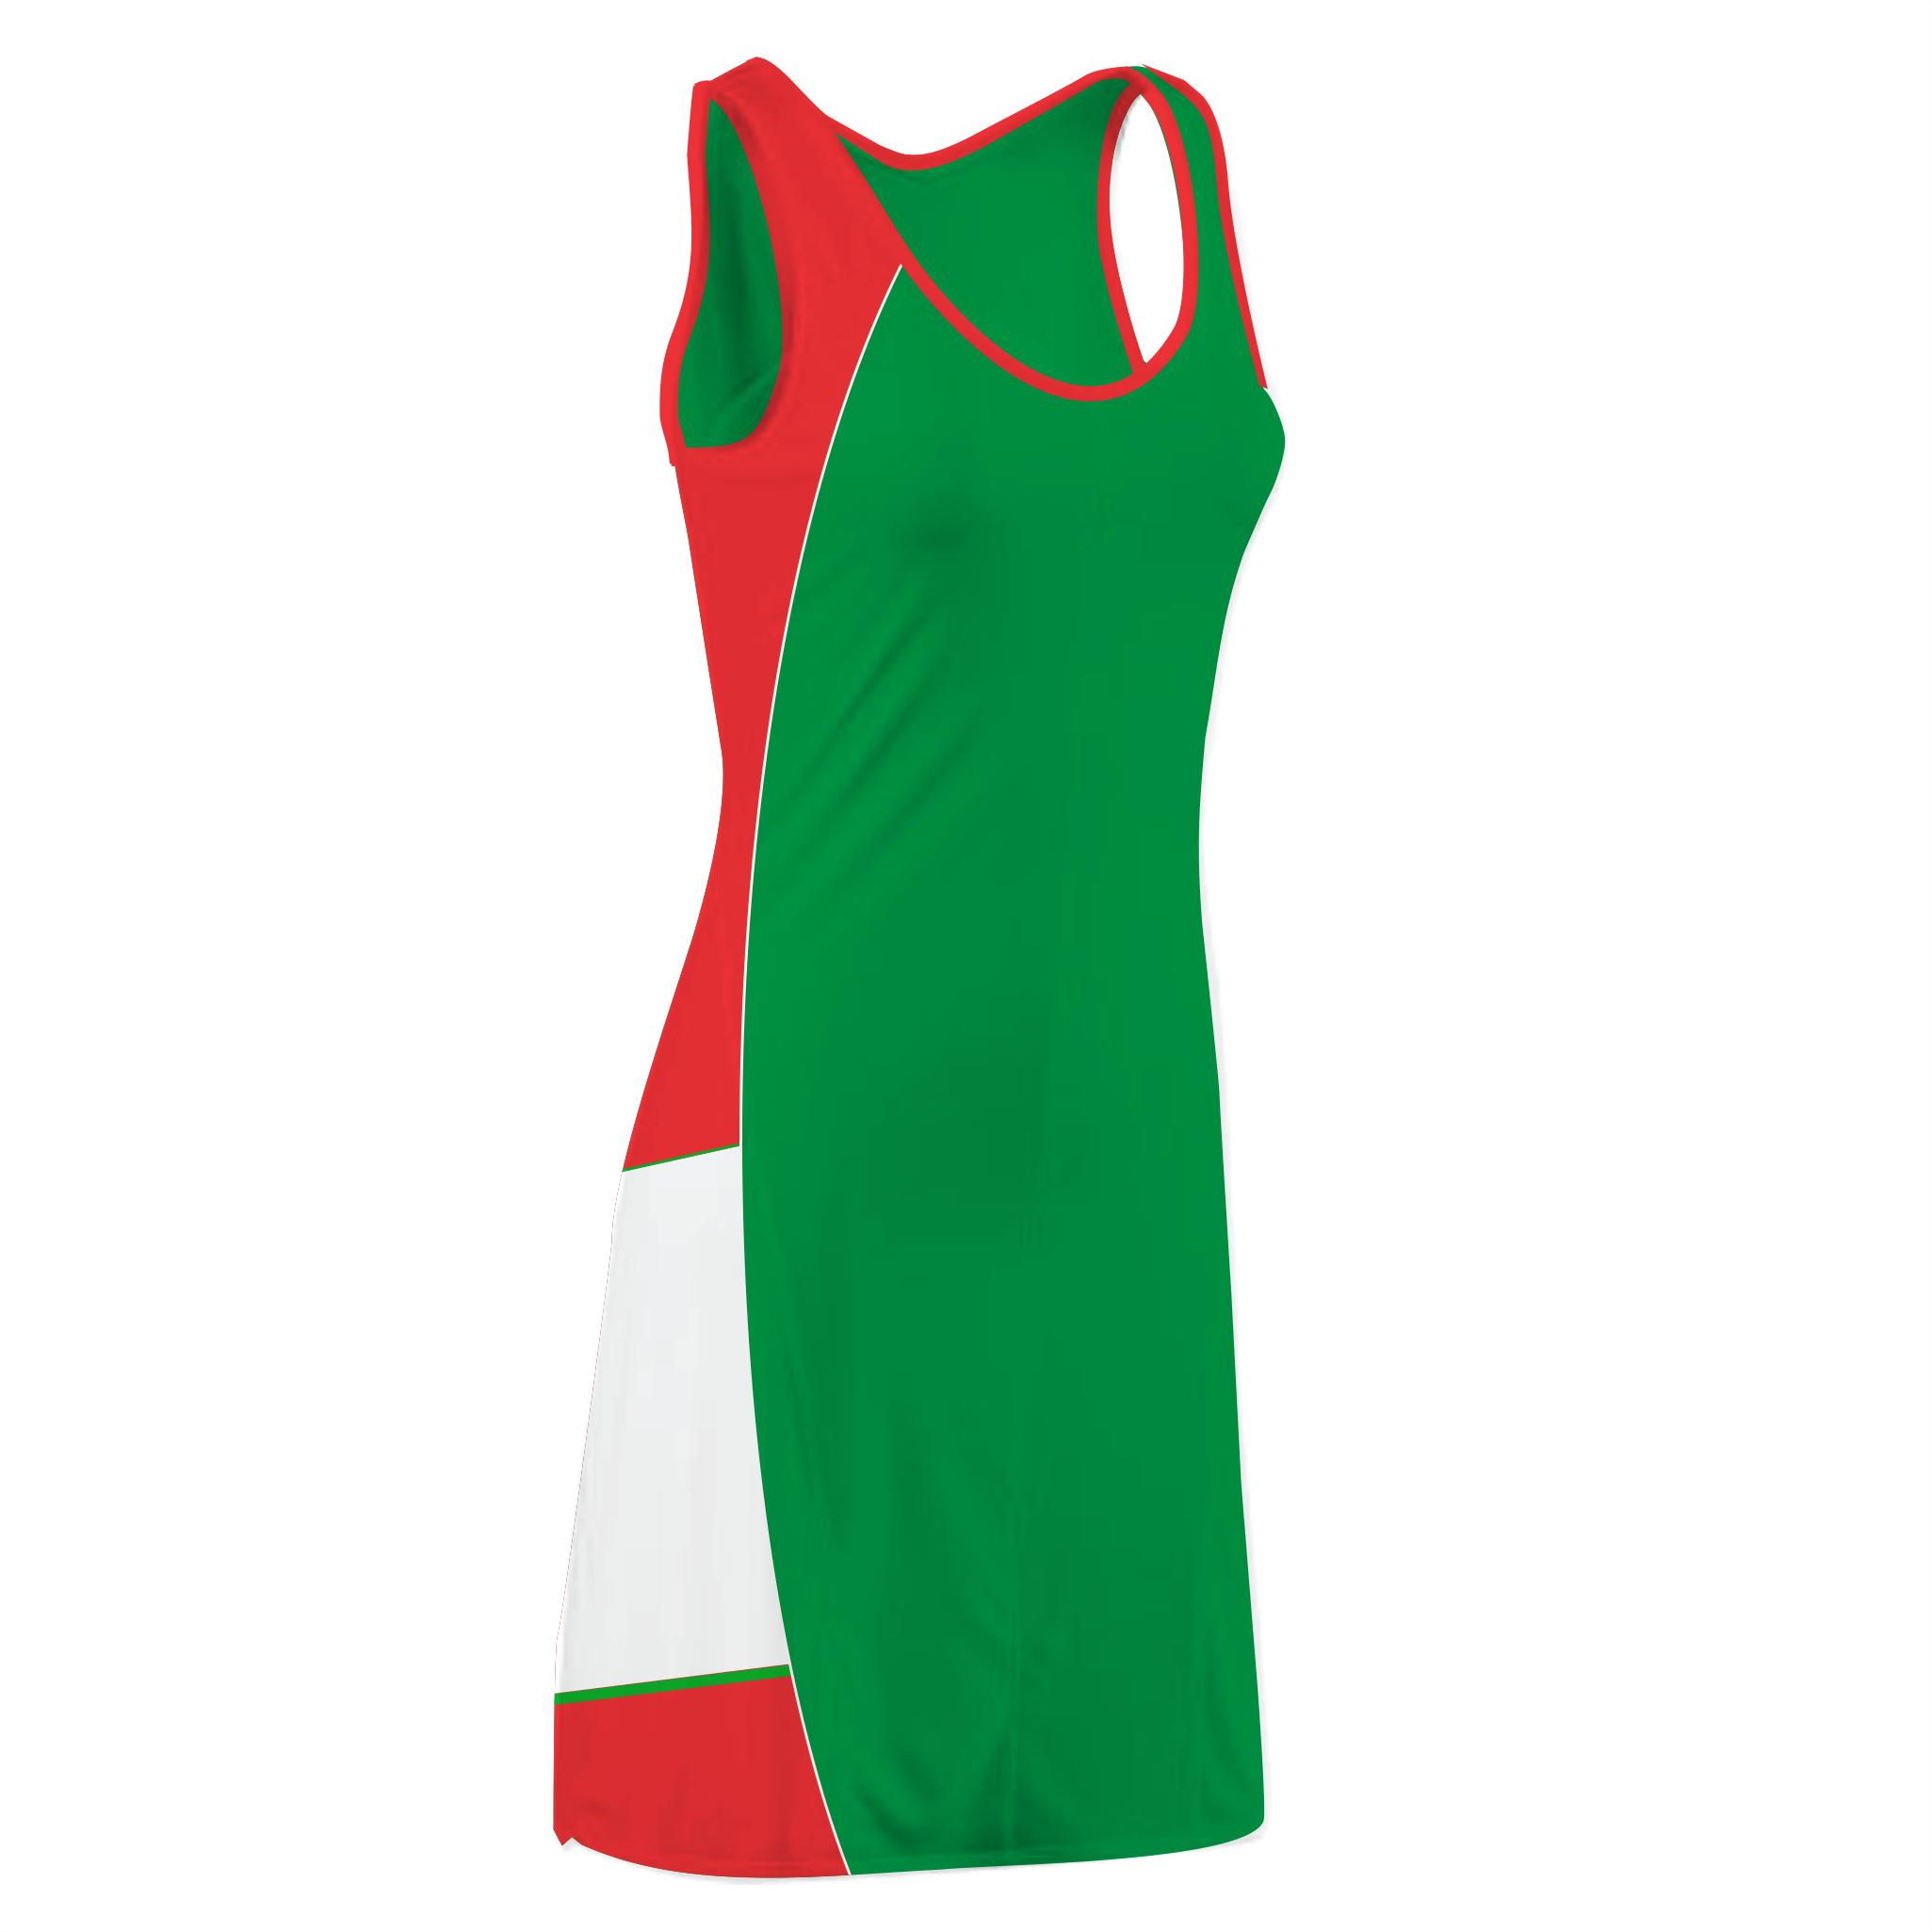 Panelled Zuco dress - Rochelle